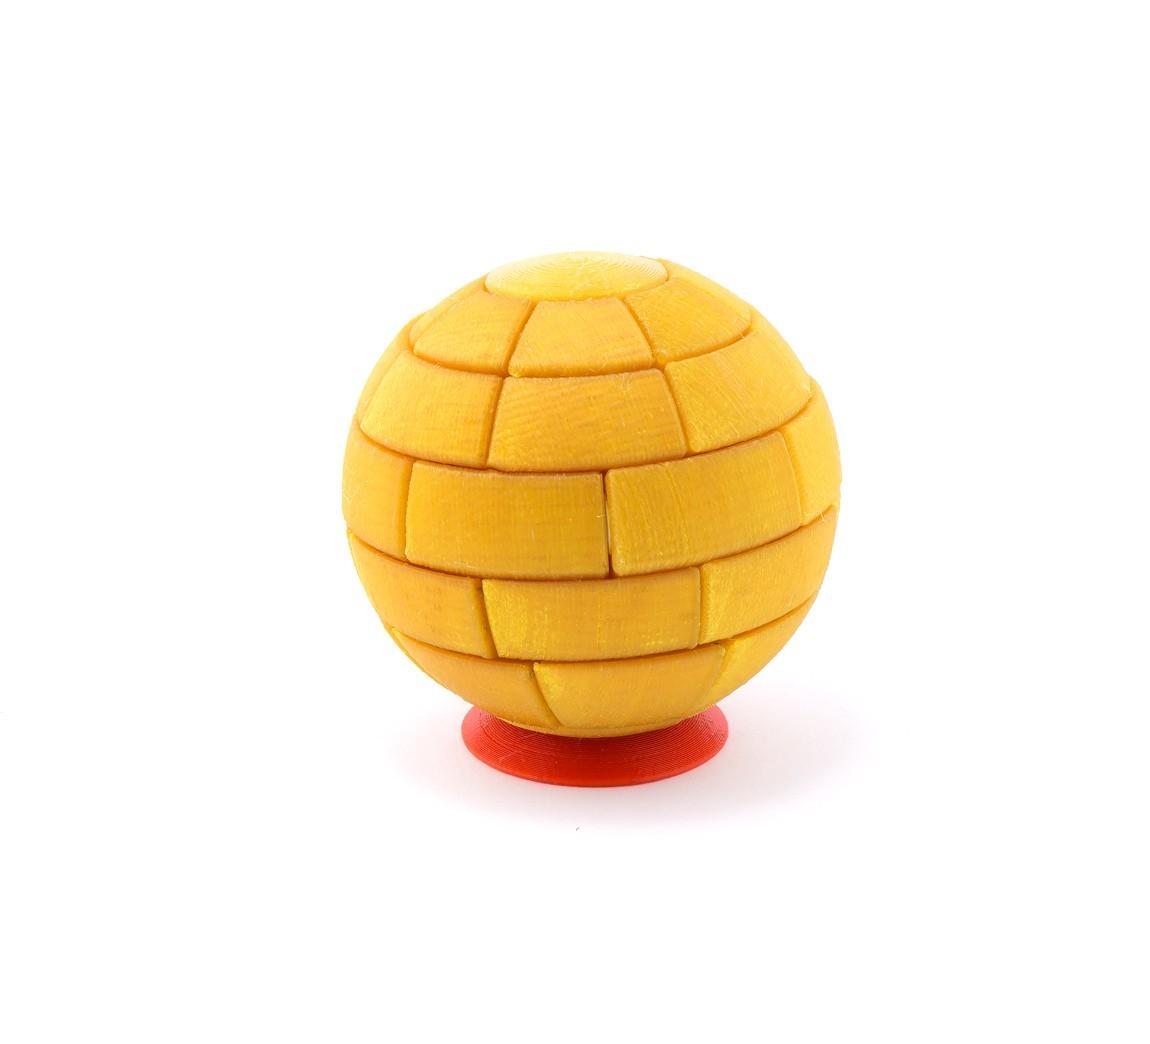 e5ddb792987f86425dde66035338dd90_1449268951762_NMD000653-7.jpg Download free STL file Sphere Builder • 3D printable object, FerryTeacher